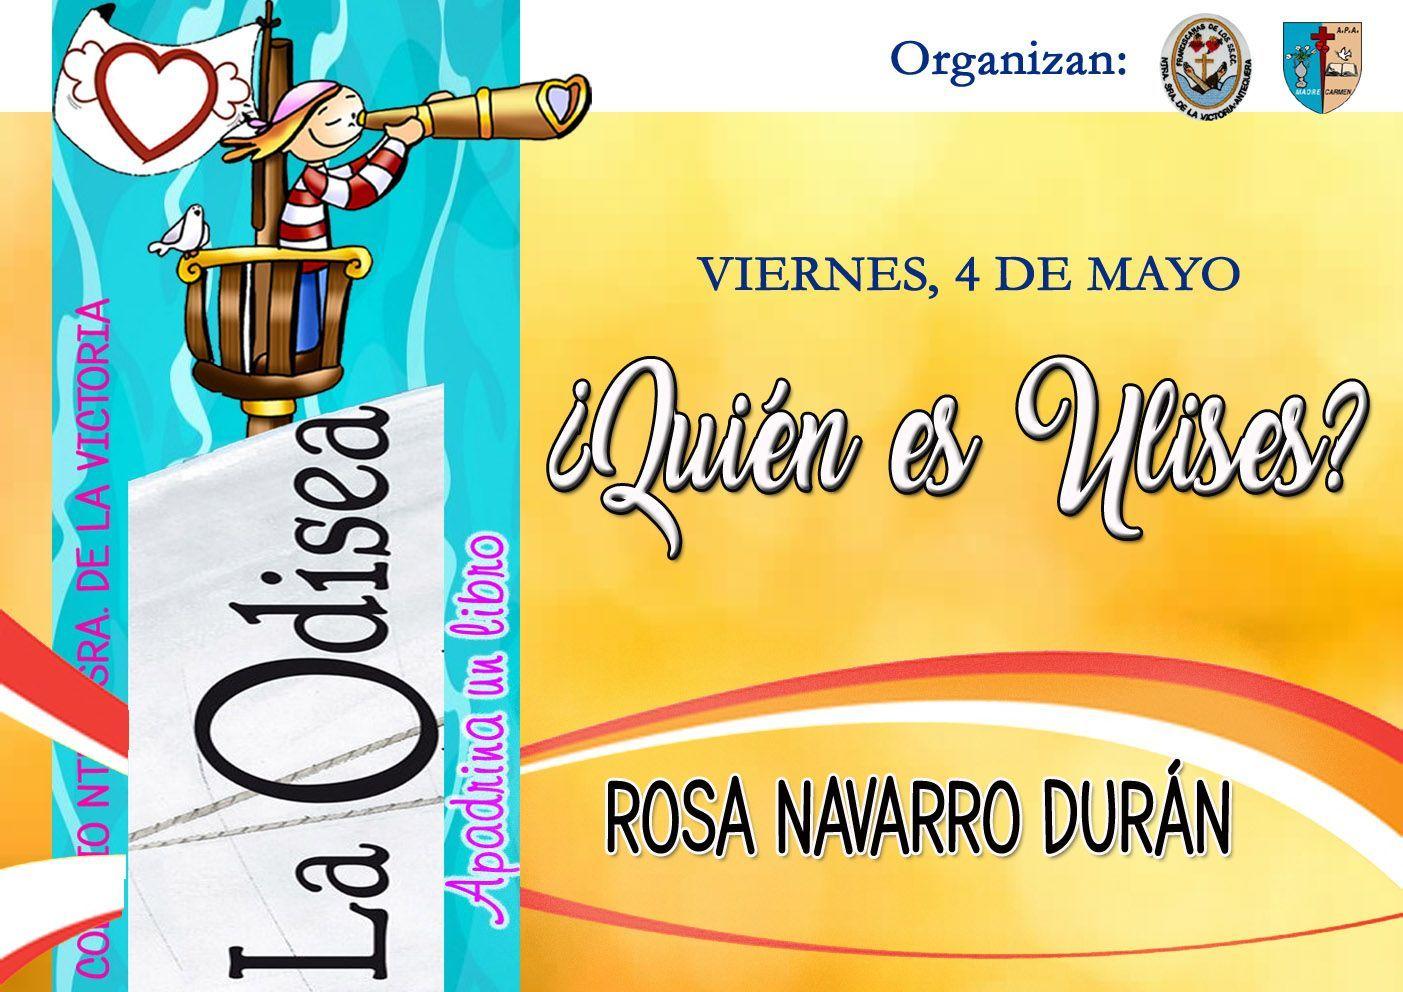 La Odisea con Rosa Navarro Durán